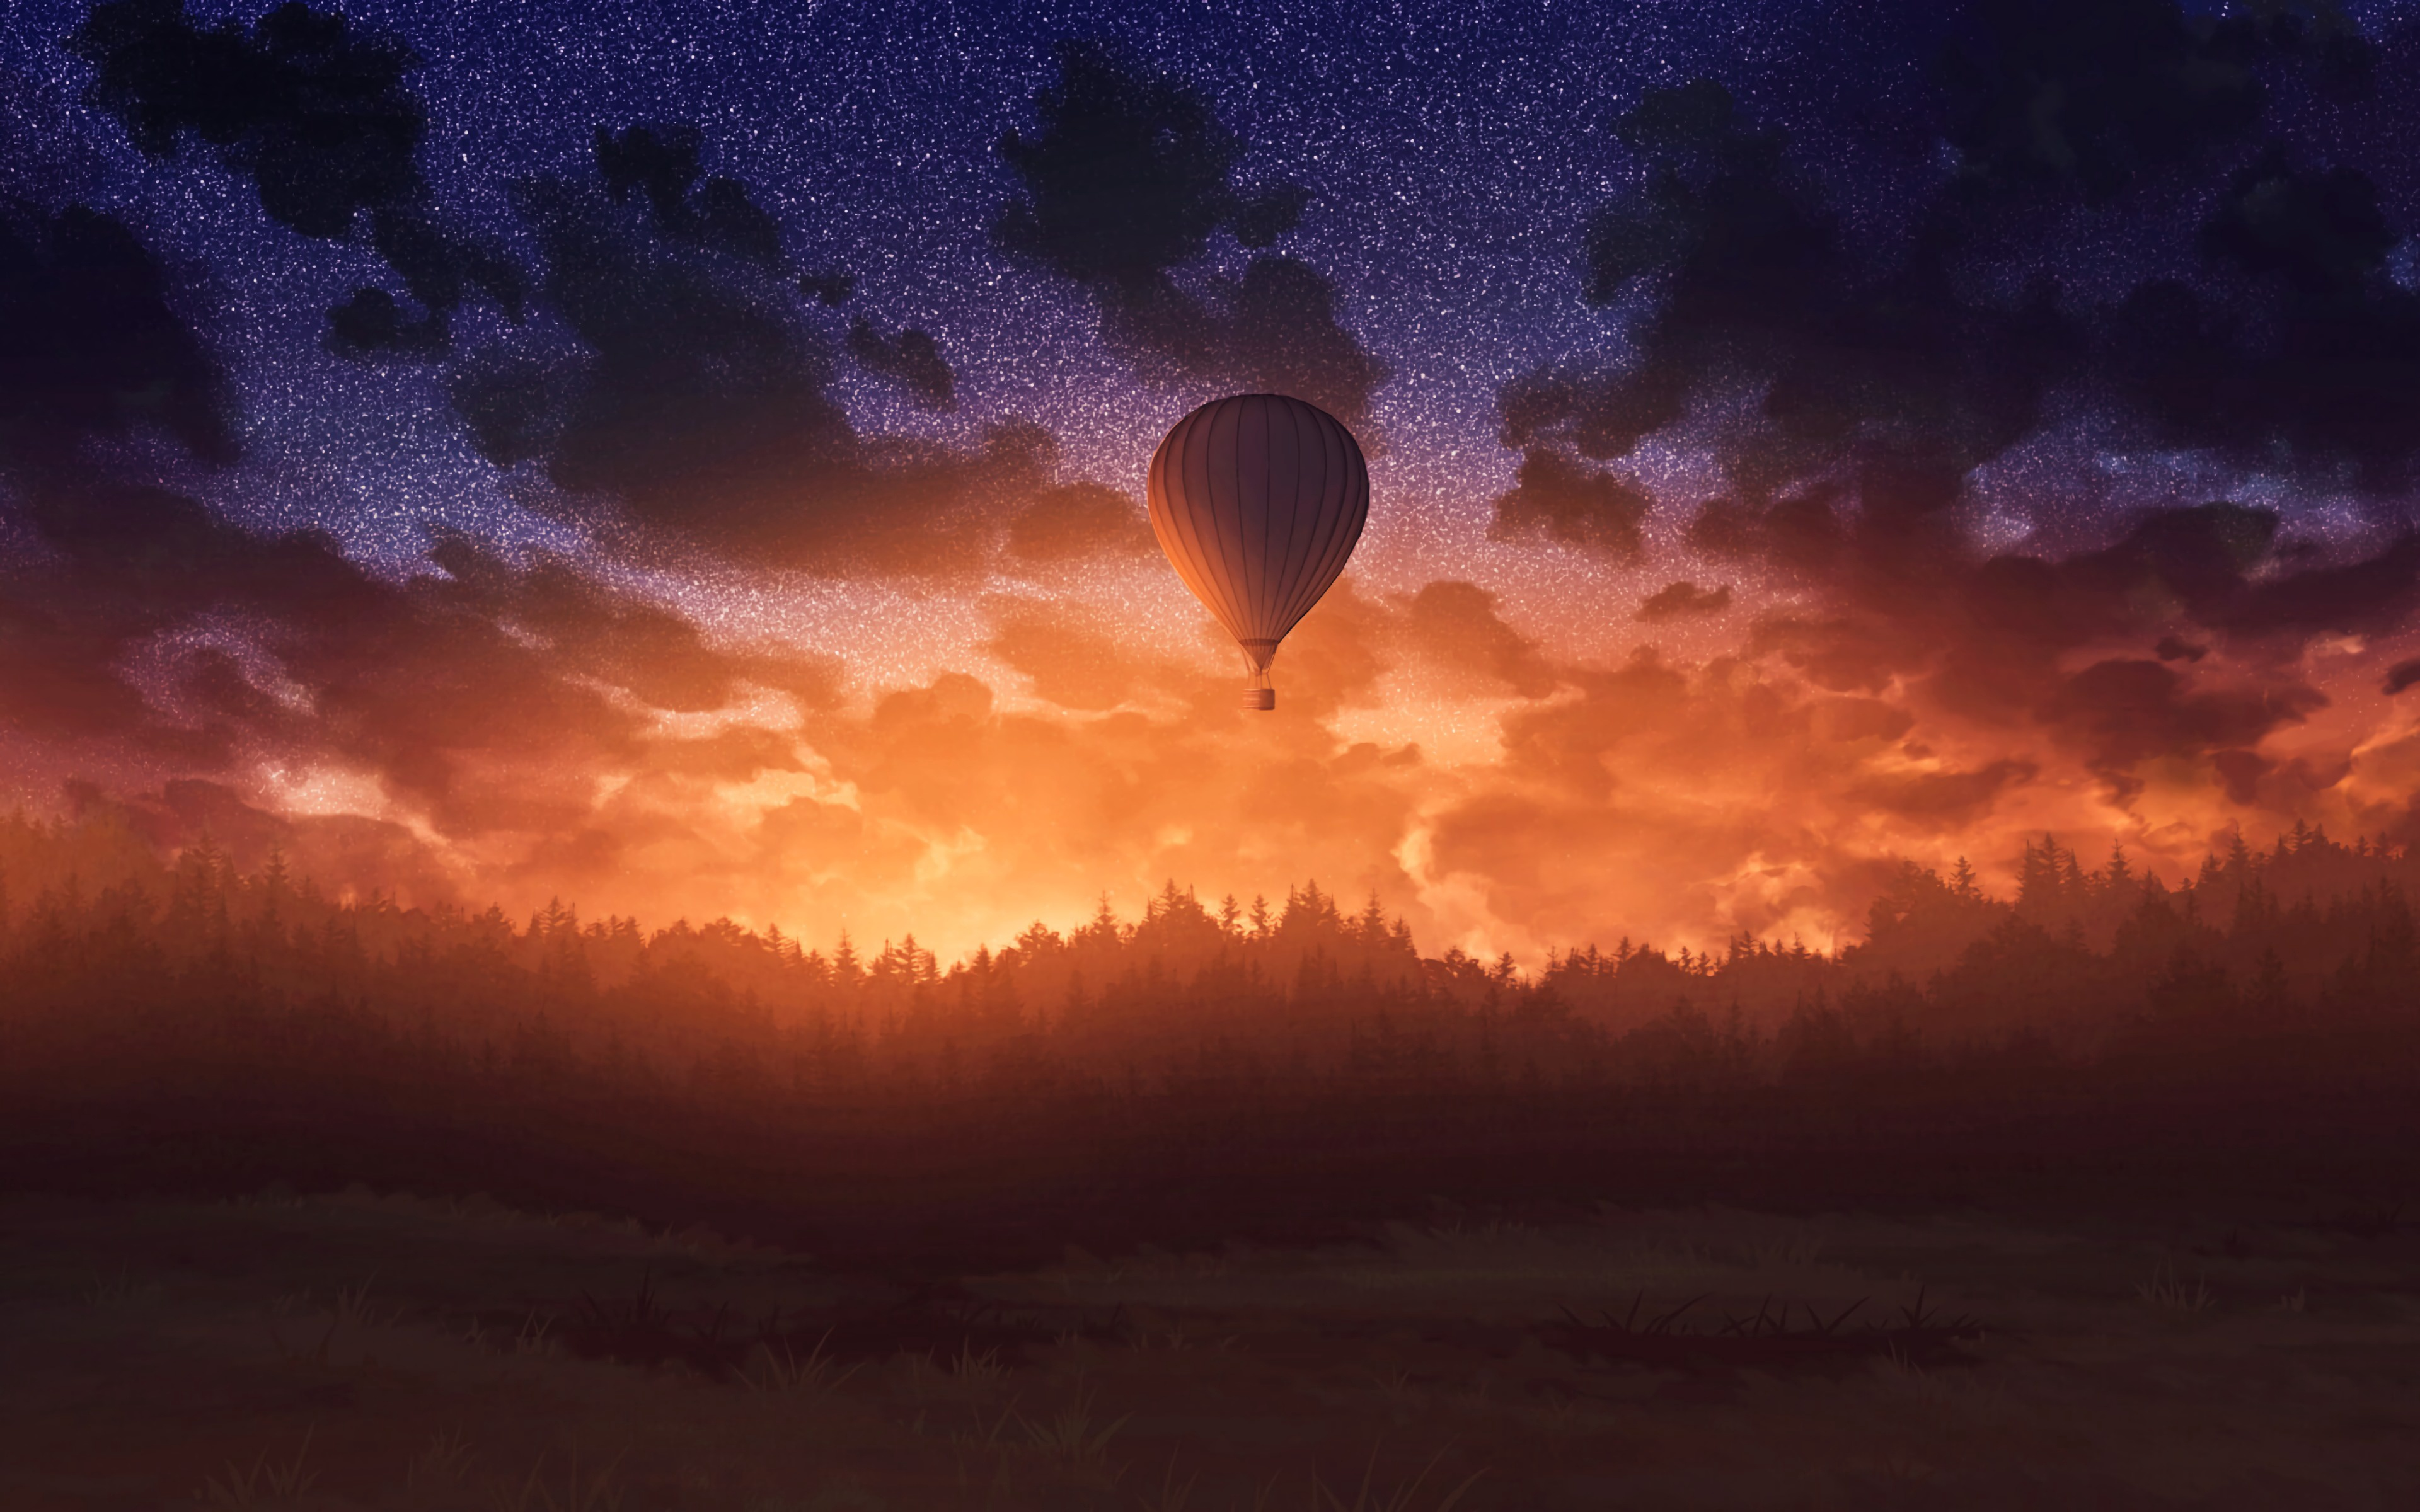 air balloons sunrise sky forest 1579381230 - Air Balloons Sunrise, Sky, Forest - Air Balloons wallpapers 4k, Air Balloons landscape wallappers 4k, Air Balloons 4k wallpapers